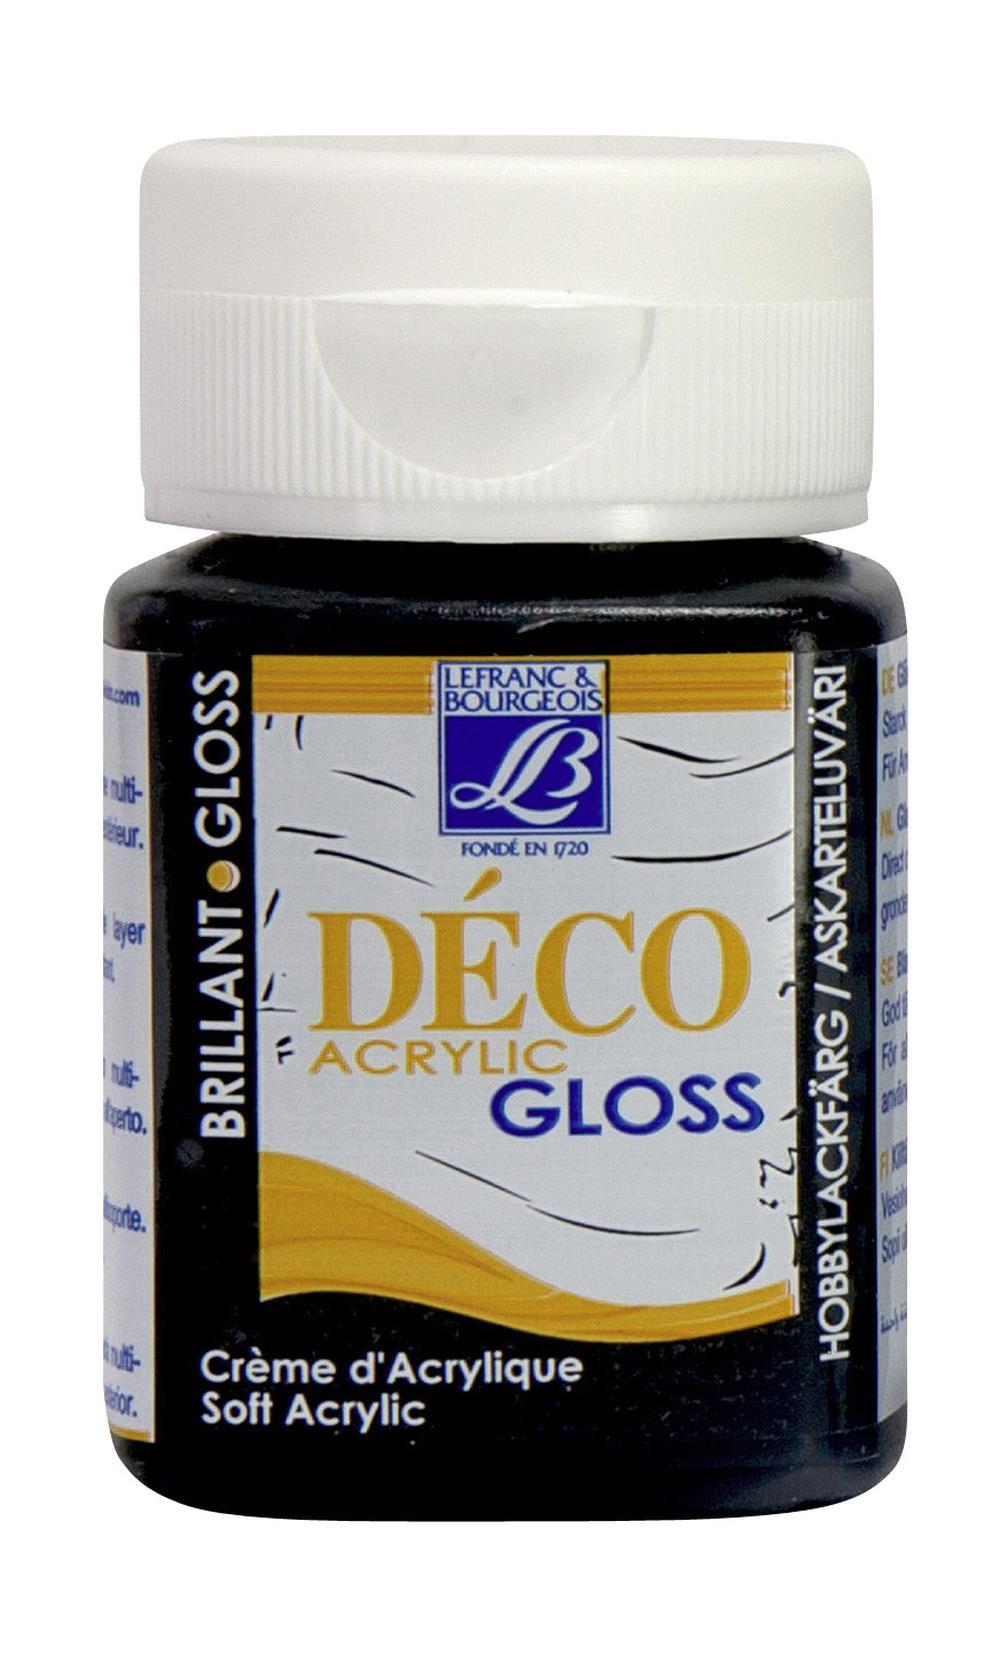 Hobbyfärg L&B Deco Gloss Akryl 50ml  Black 265 (4F) Utgår